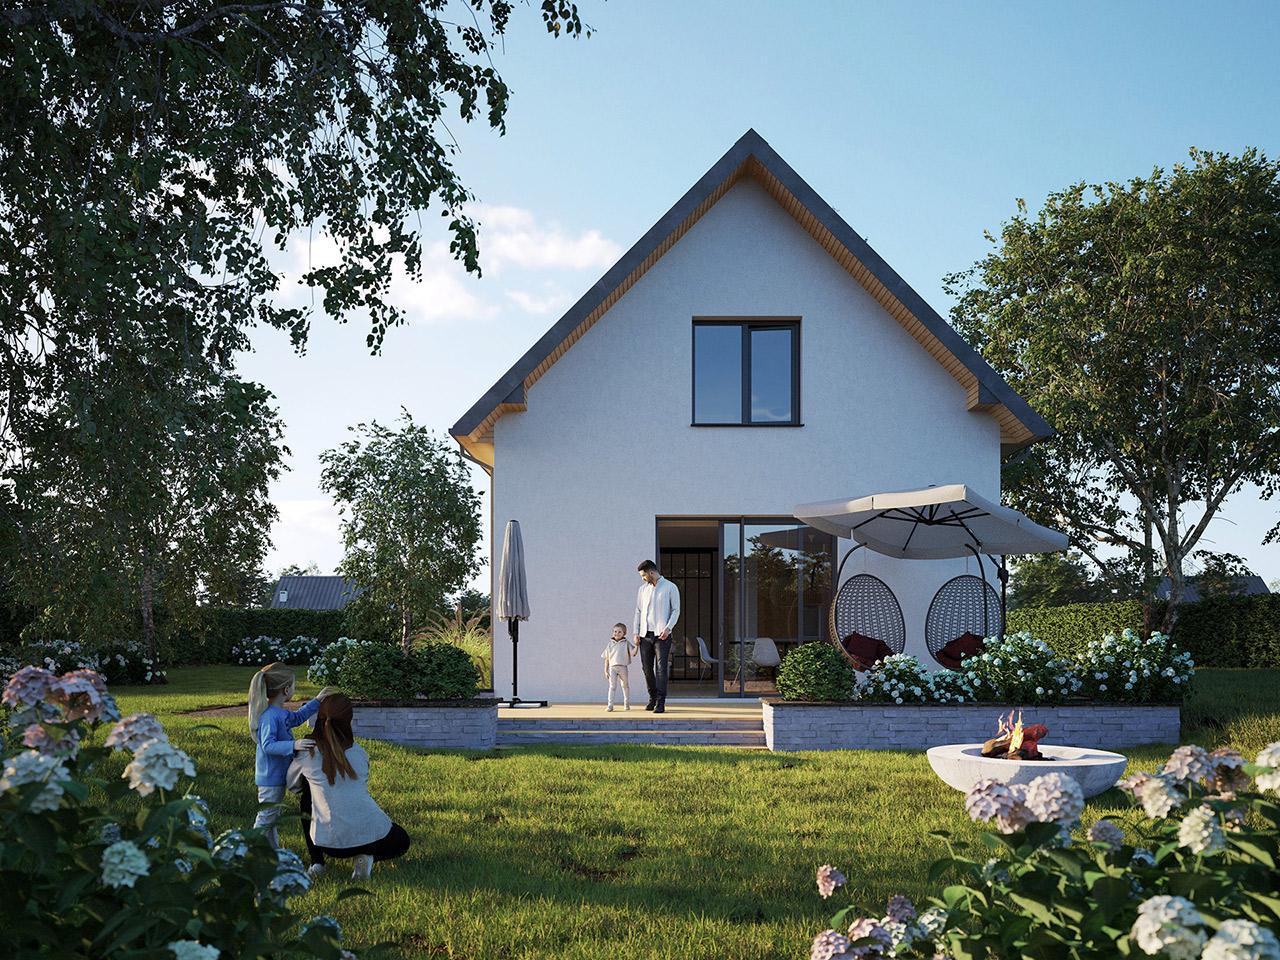 Projekt domu z poddaszem 116m2 za 145tys